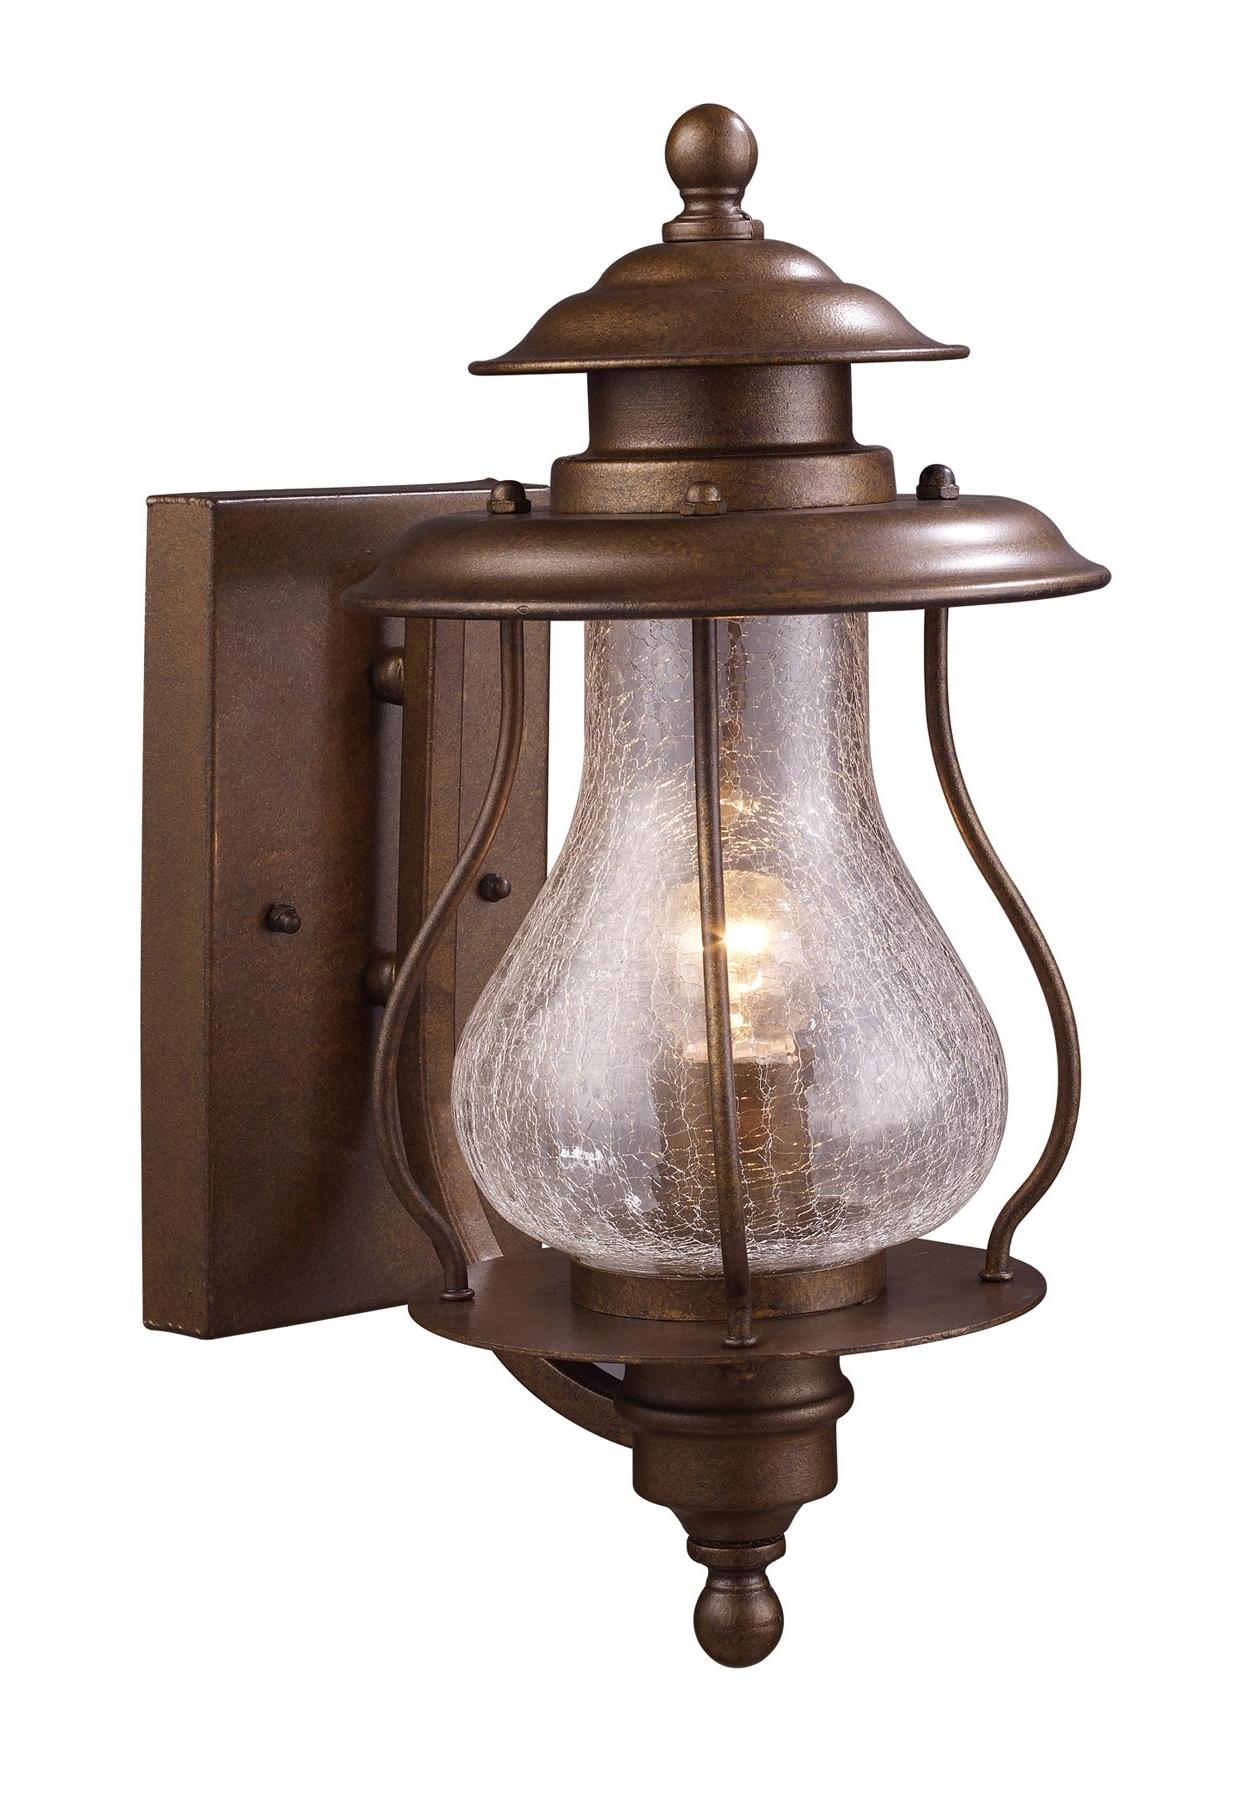 Elk Lighting 62005 1 Wikshire Outdoor Wall Mount Lantern Inside Preferred Outdoor Lanterns Lights (Gallery 12 of 20)